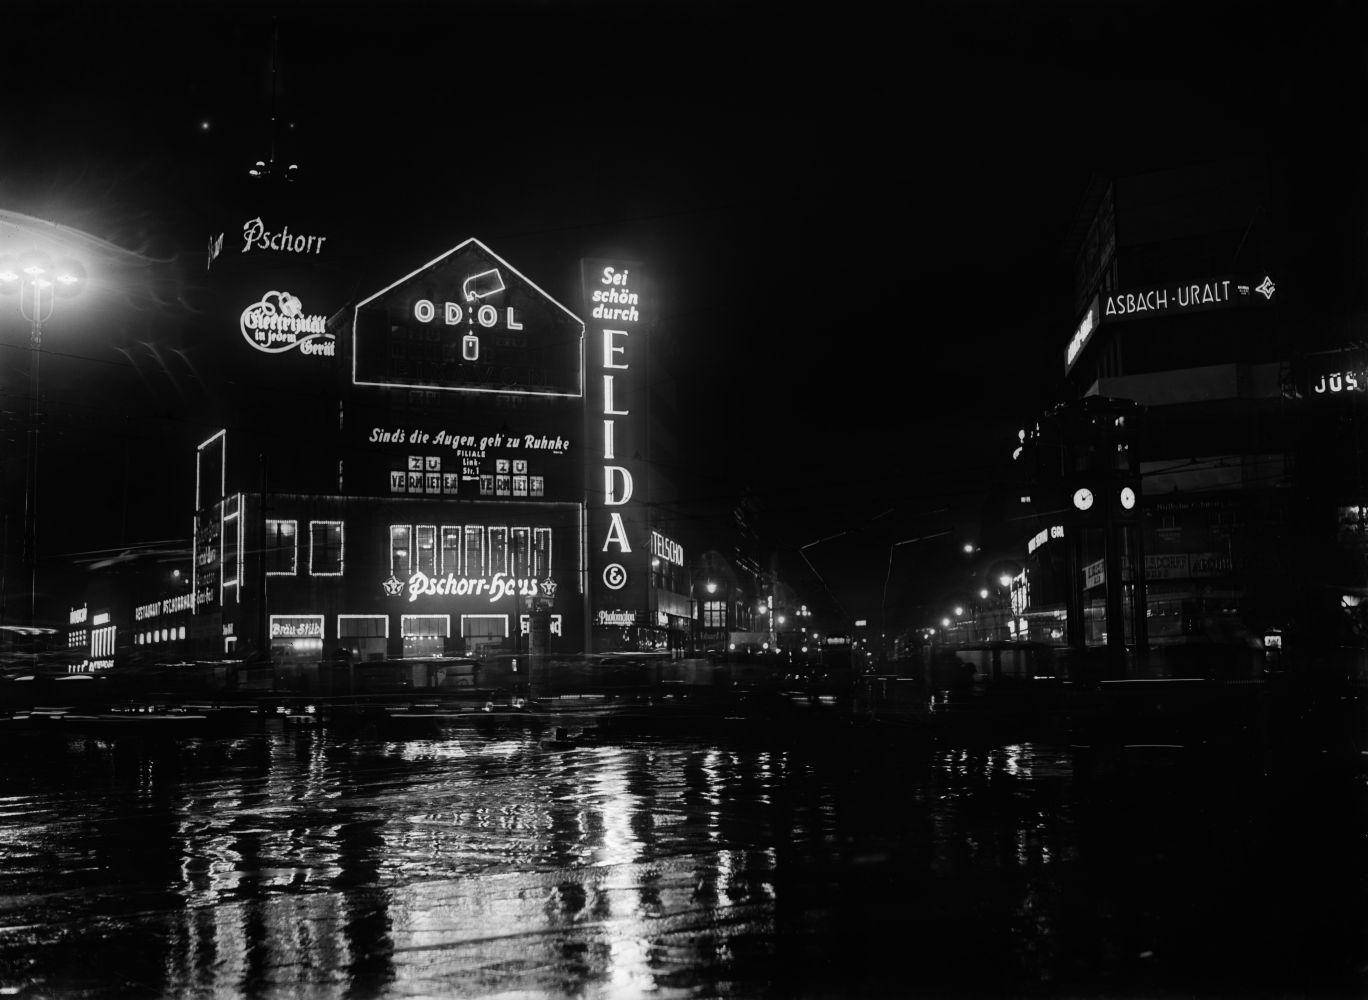 Willy Römer: Potsdamer Platz bei Nacht, Blick zum Pschorr-Haus (1929), Copyright bpk / Kunstbibliothek, SMB, Photothek Willy Römer / Willy Römer